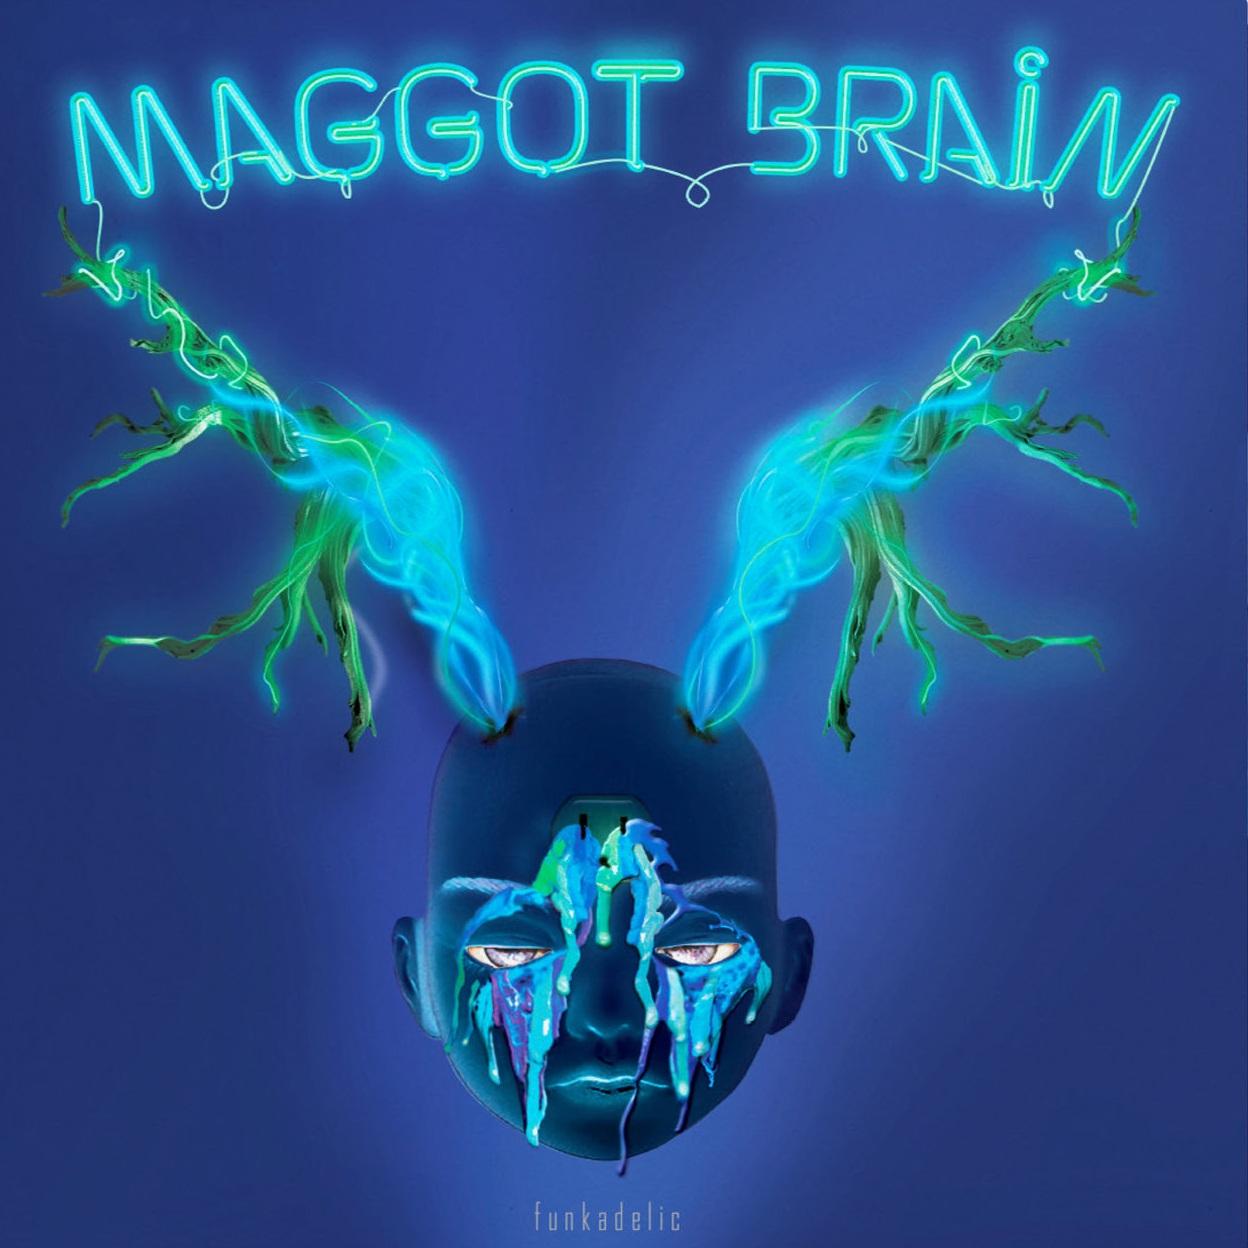 Funkadelic's Maggot Brain EP